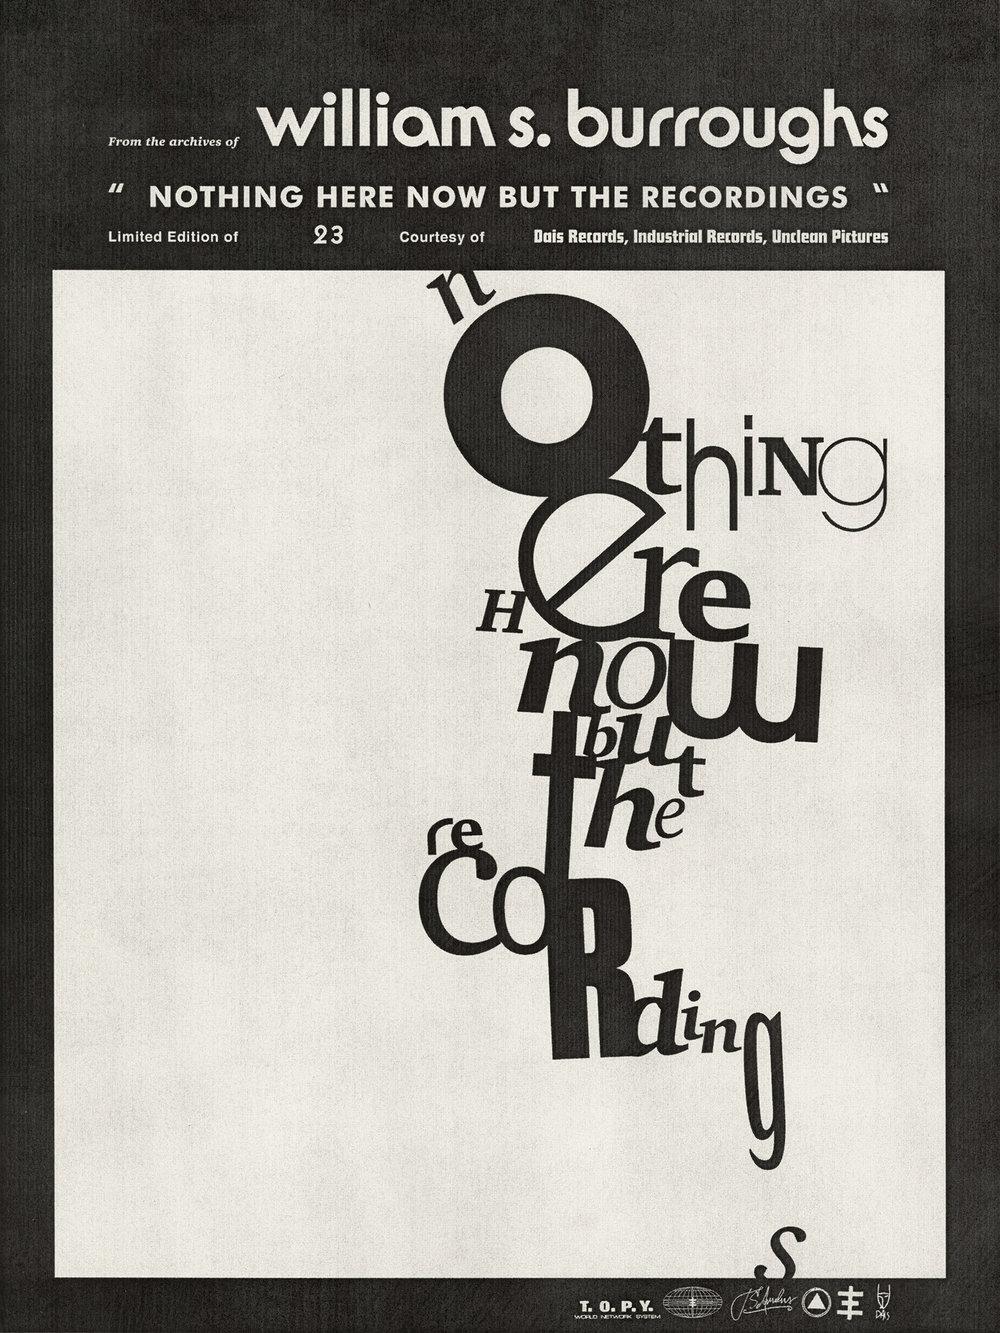 WSB---NHNBTR-poster---proof_1890.jpg